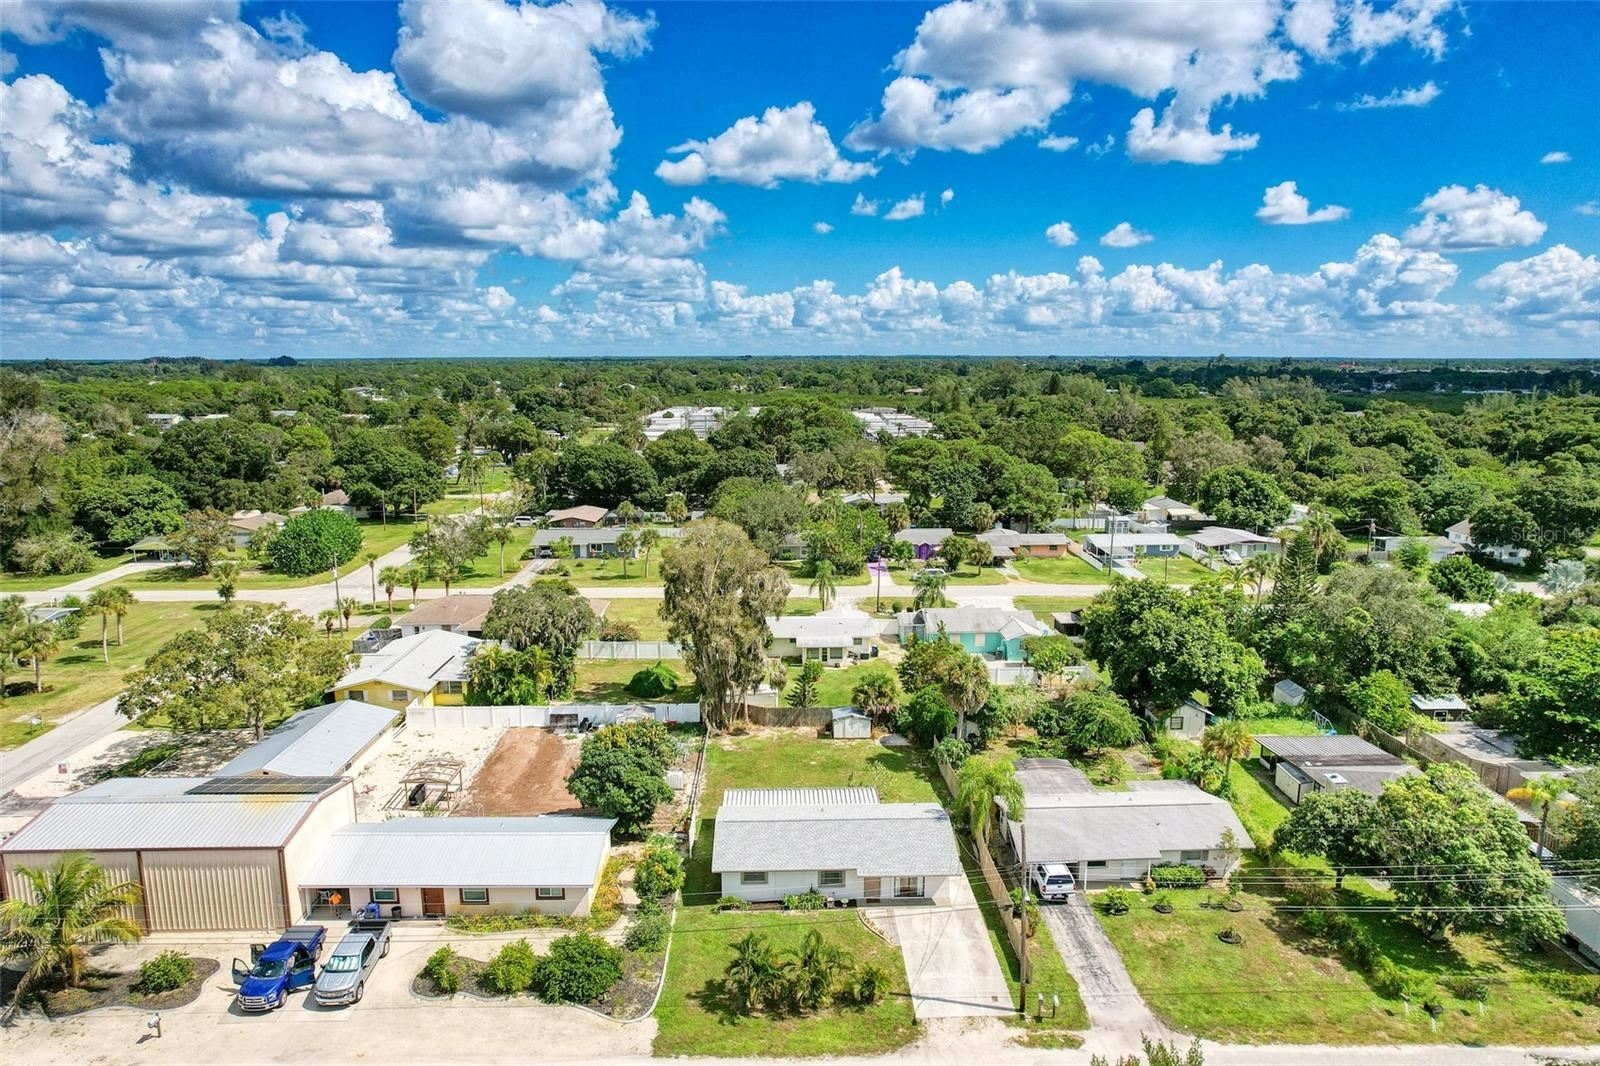 Photo of 835 SPRUCE STREET, ENGLEWOOD, FL 34223 (MLS # A4514848)